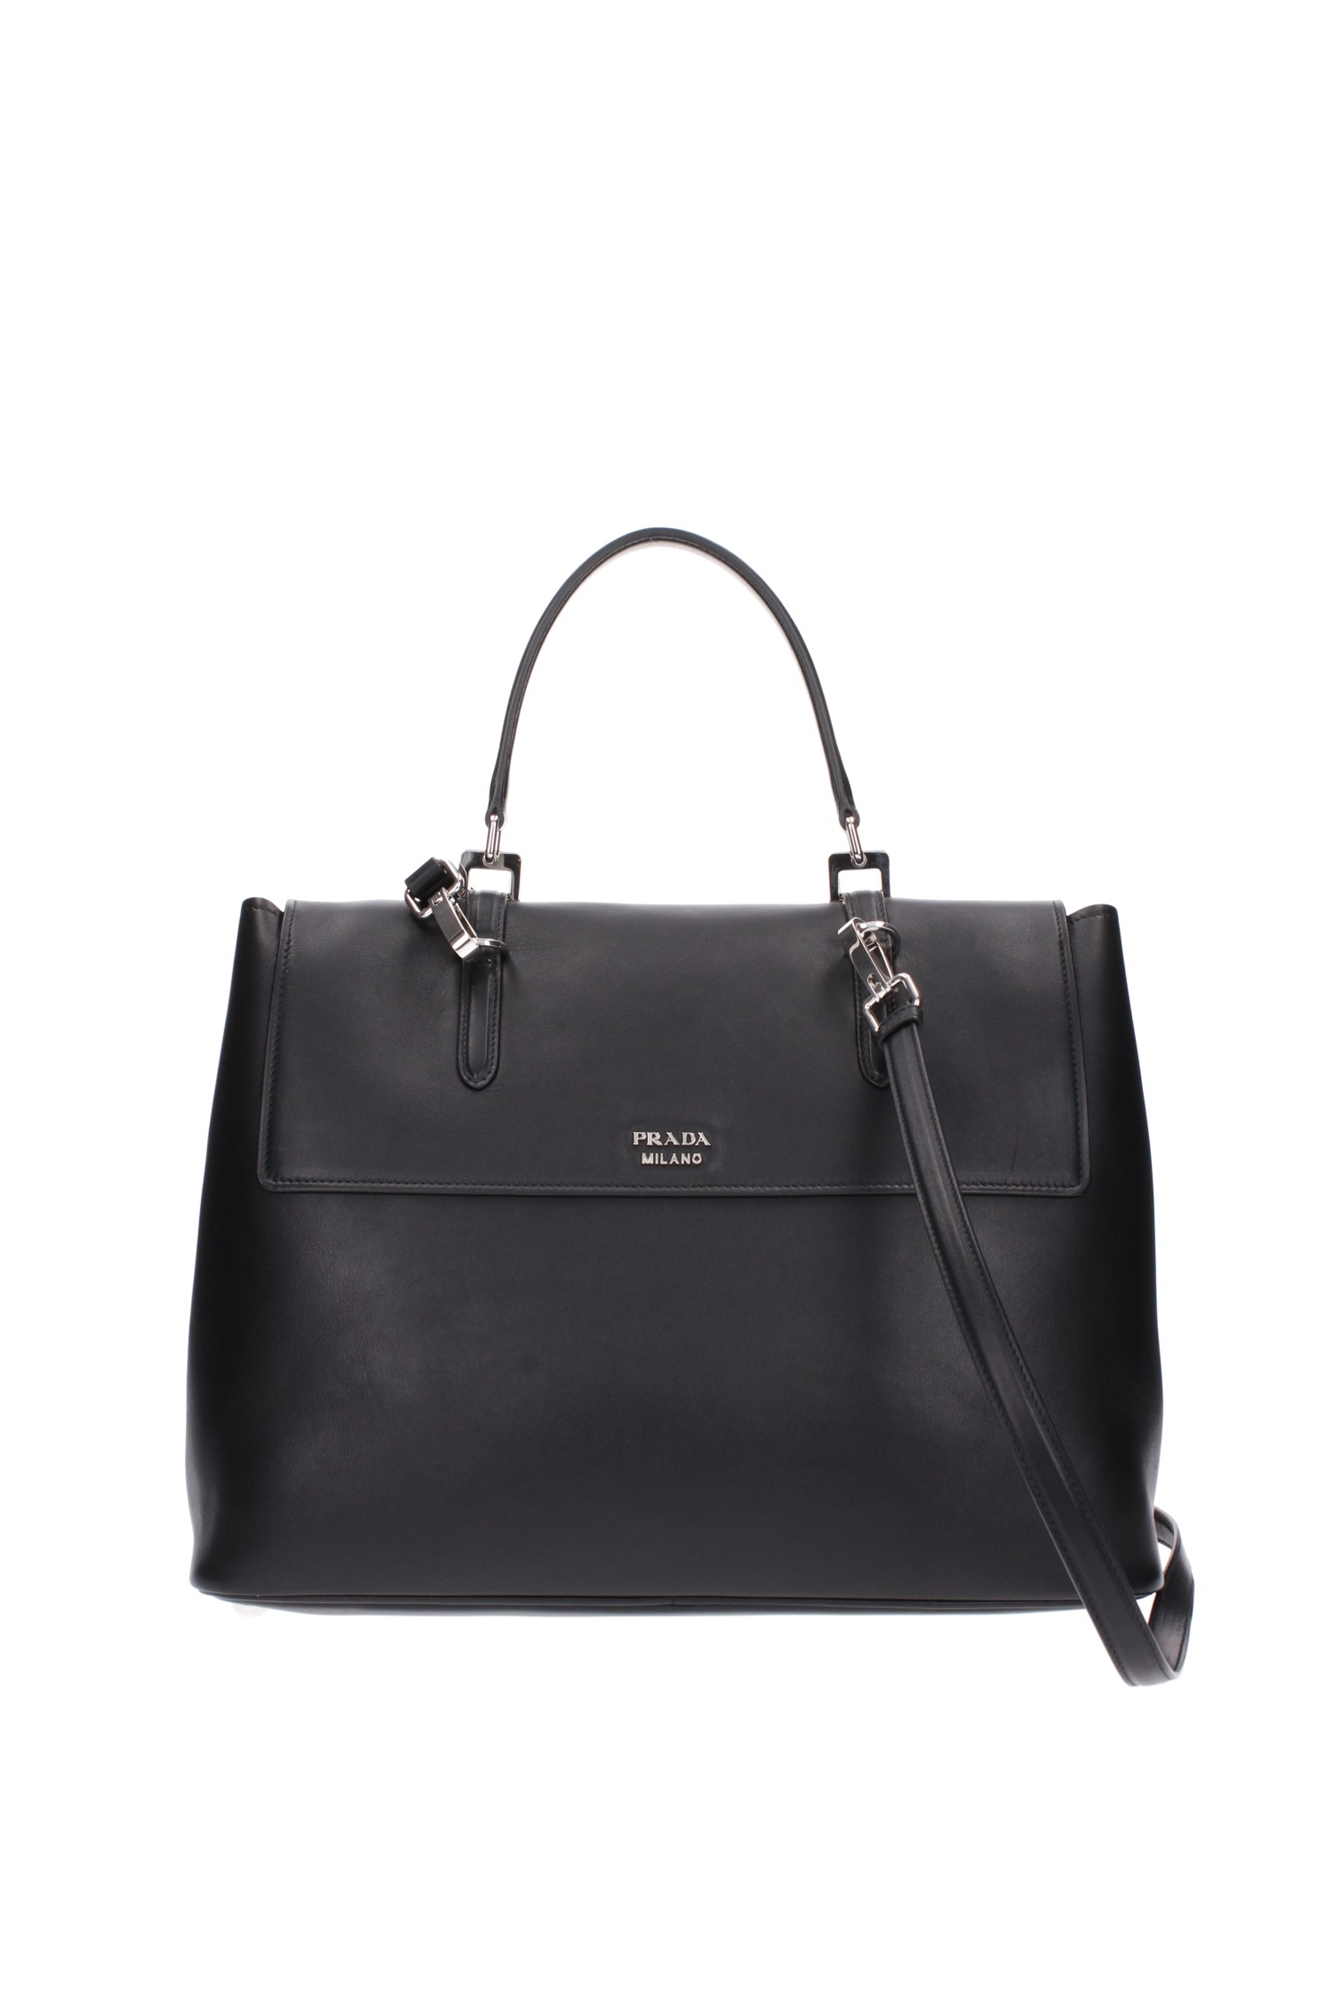 handtasche prada damen leder schwarz bn2790nero ebay. Black Bedroom Furniture Sets. Home Design Ideas